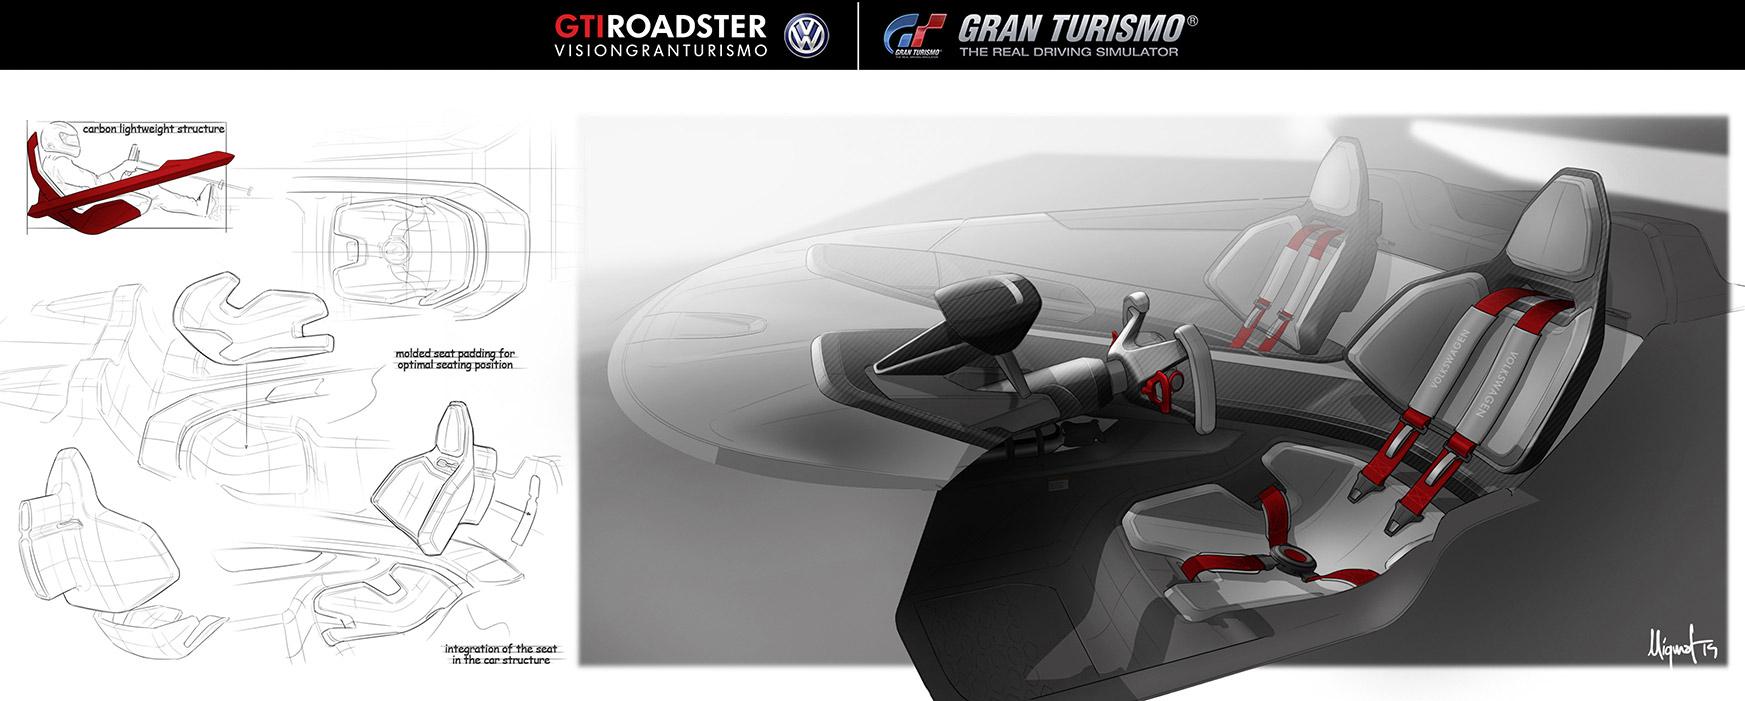 volkswagen-design-vision-gti-gran-turismo-010